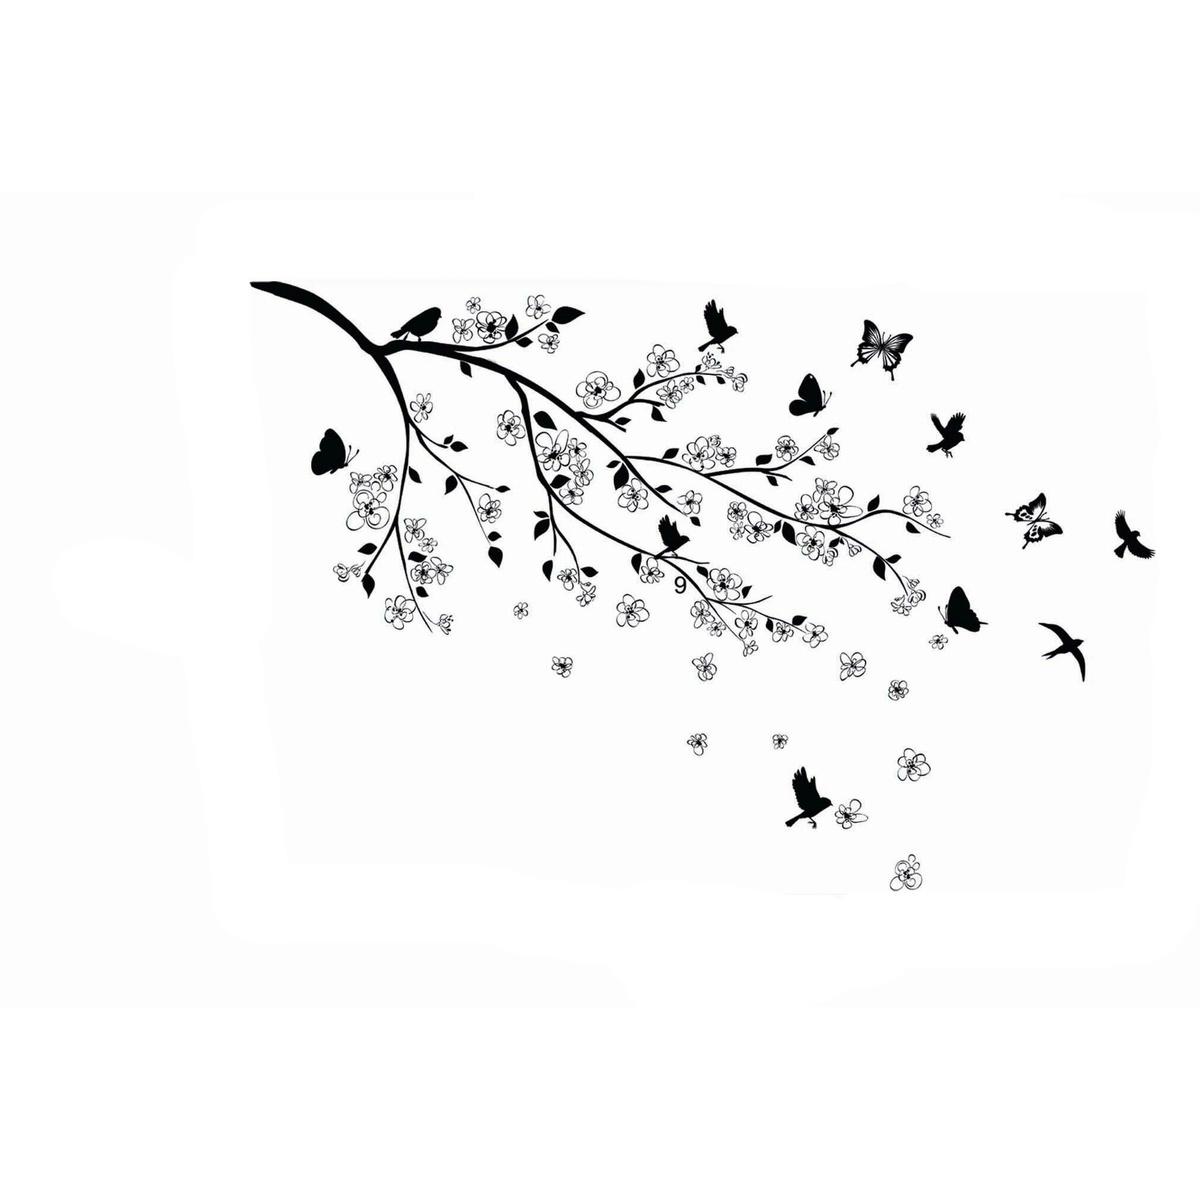 Samolepaca dekorácia letíme z hniezda